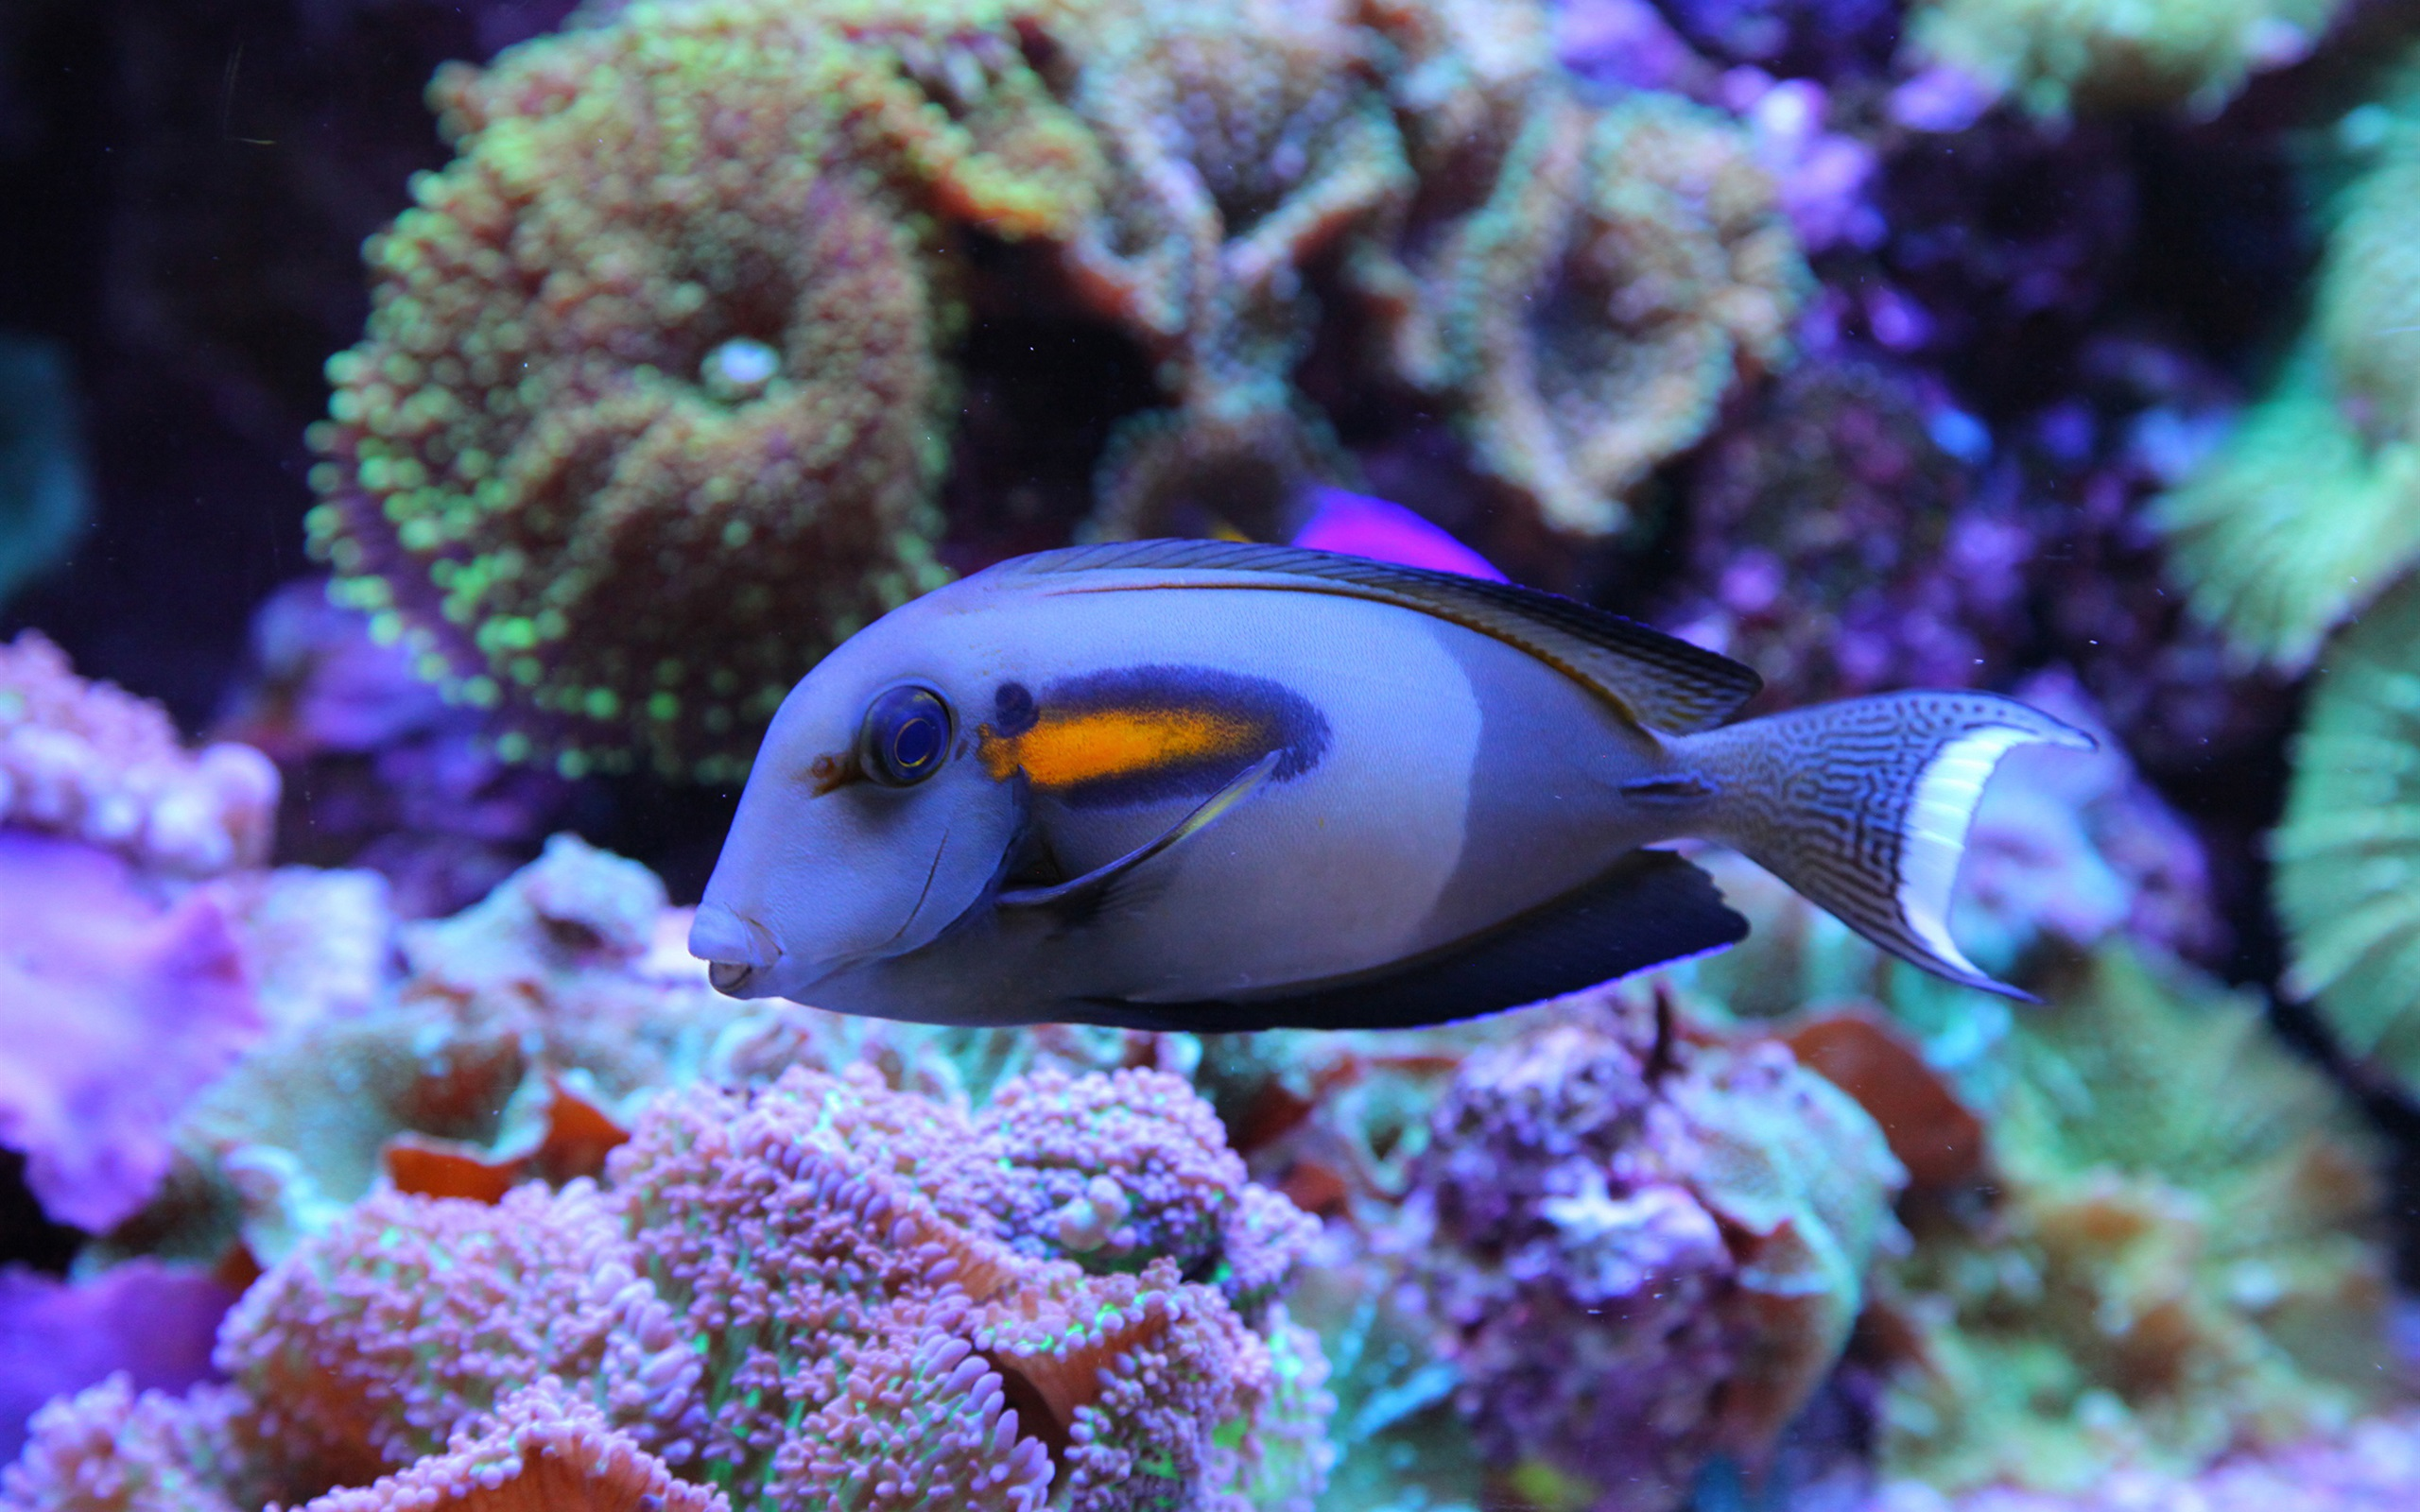 Wallpaper Blue Fish Underwater Sea Coral Reef 2560x1600 HD